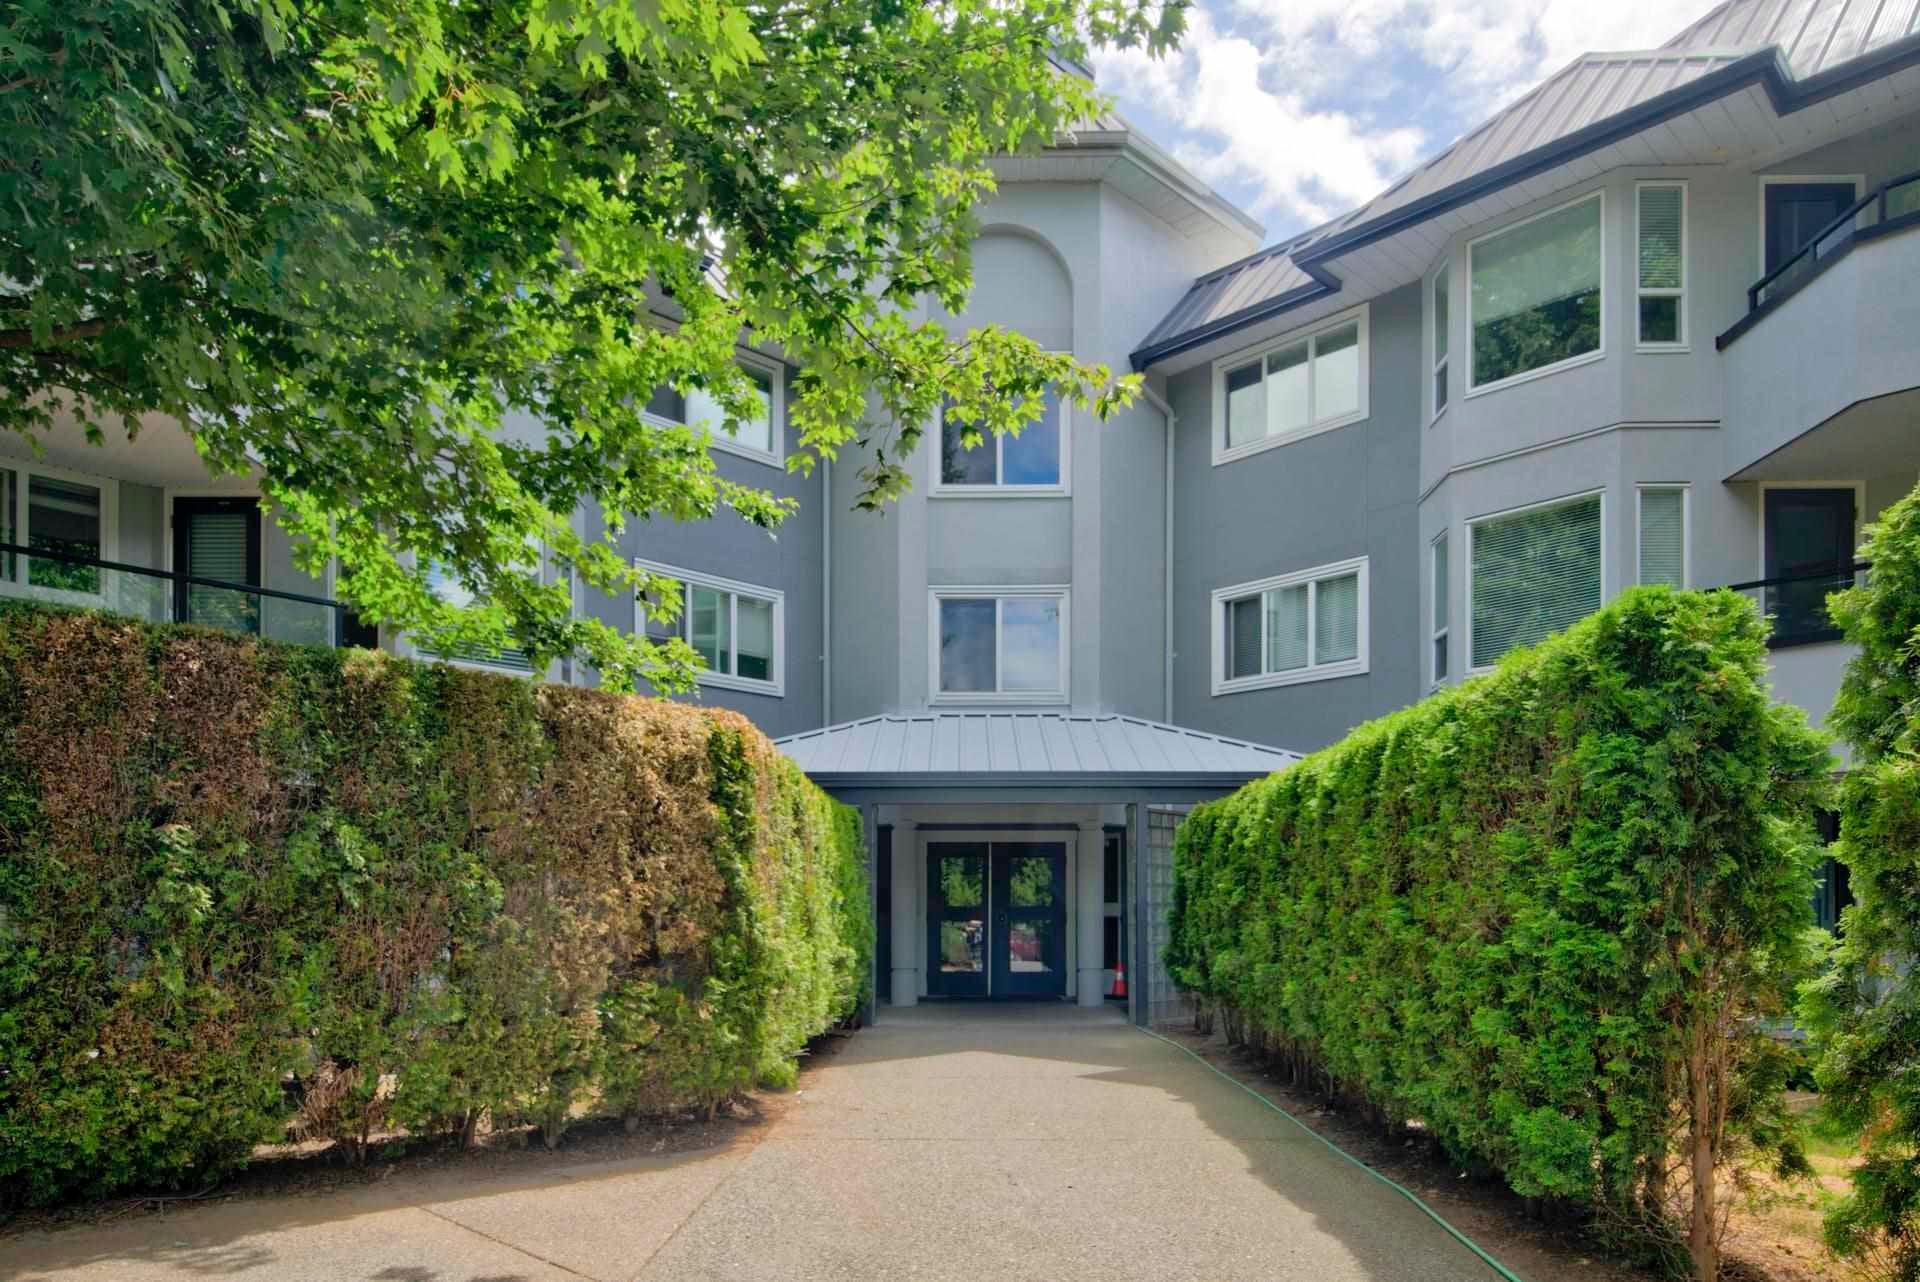 108 2700 MCCALLUM ROAD - Central Abbotsford Apartment/Condo for sale, 2 Bedrooms (R2604622) - #1